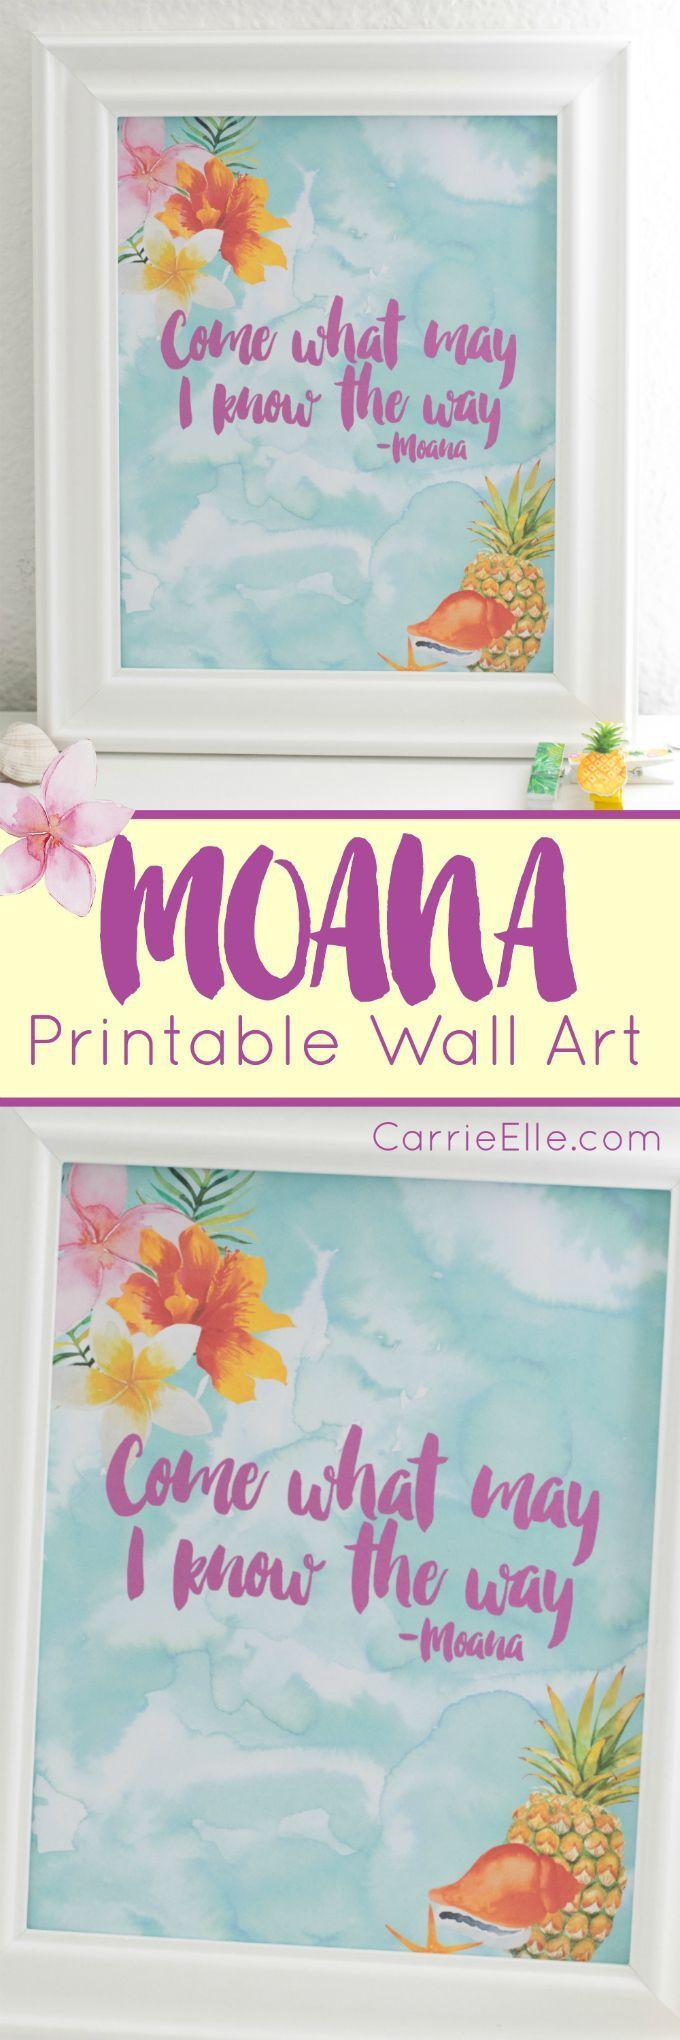 Moana Printable Wall Art (sponsored)